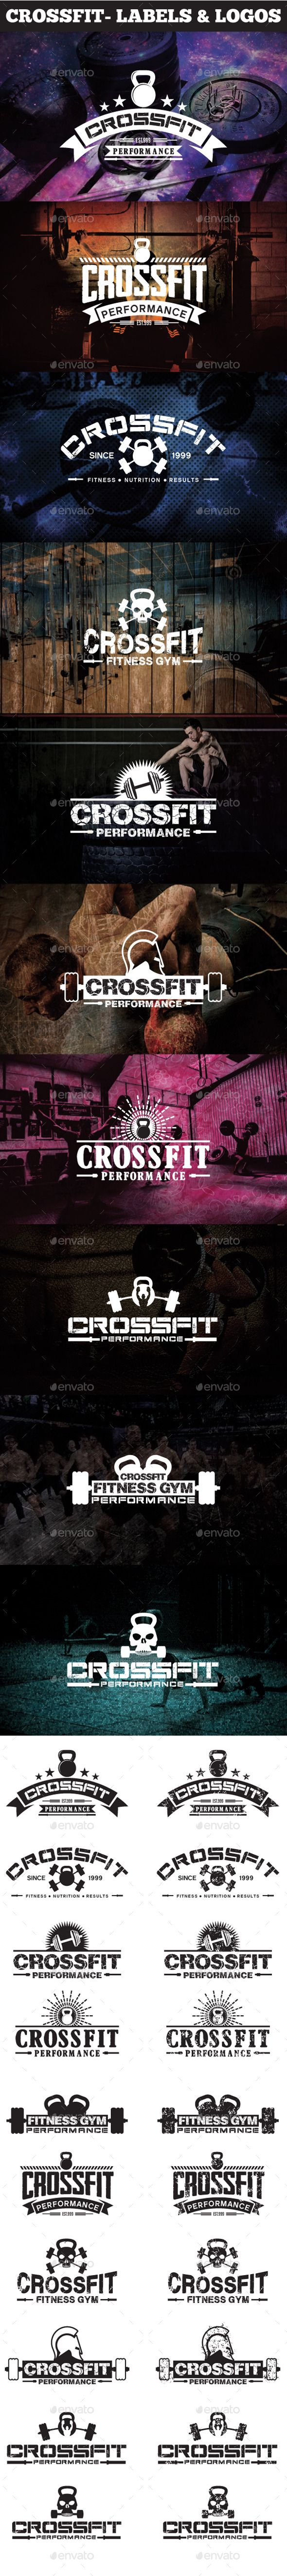 Crossfit- Labels & Logos Design. Download: http://graphicriver.net/item/crossfit-labels-logos/11426694?ref=ksioks